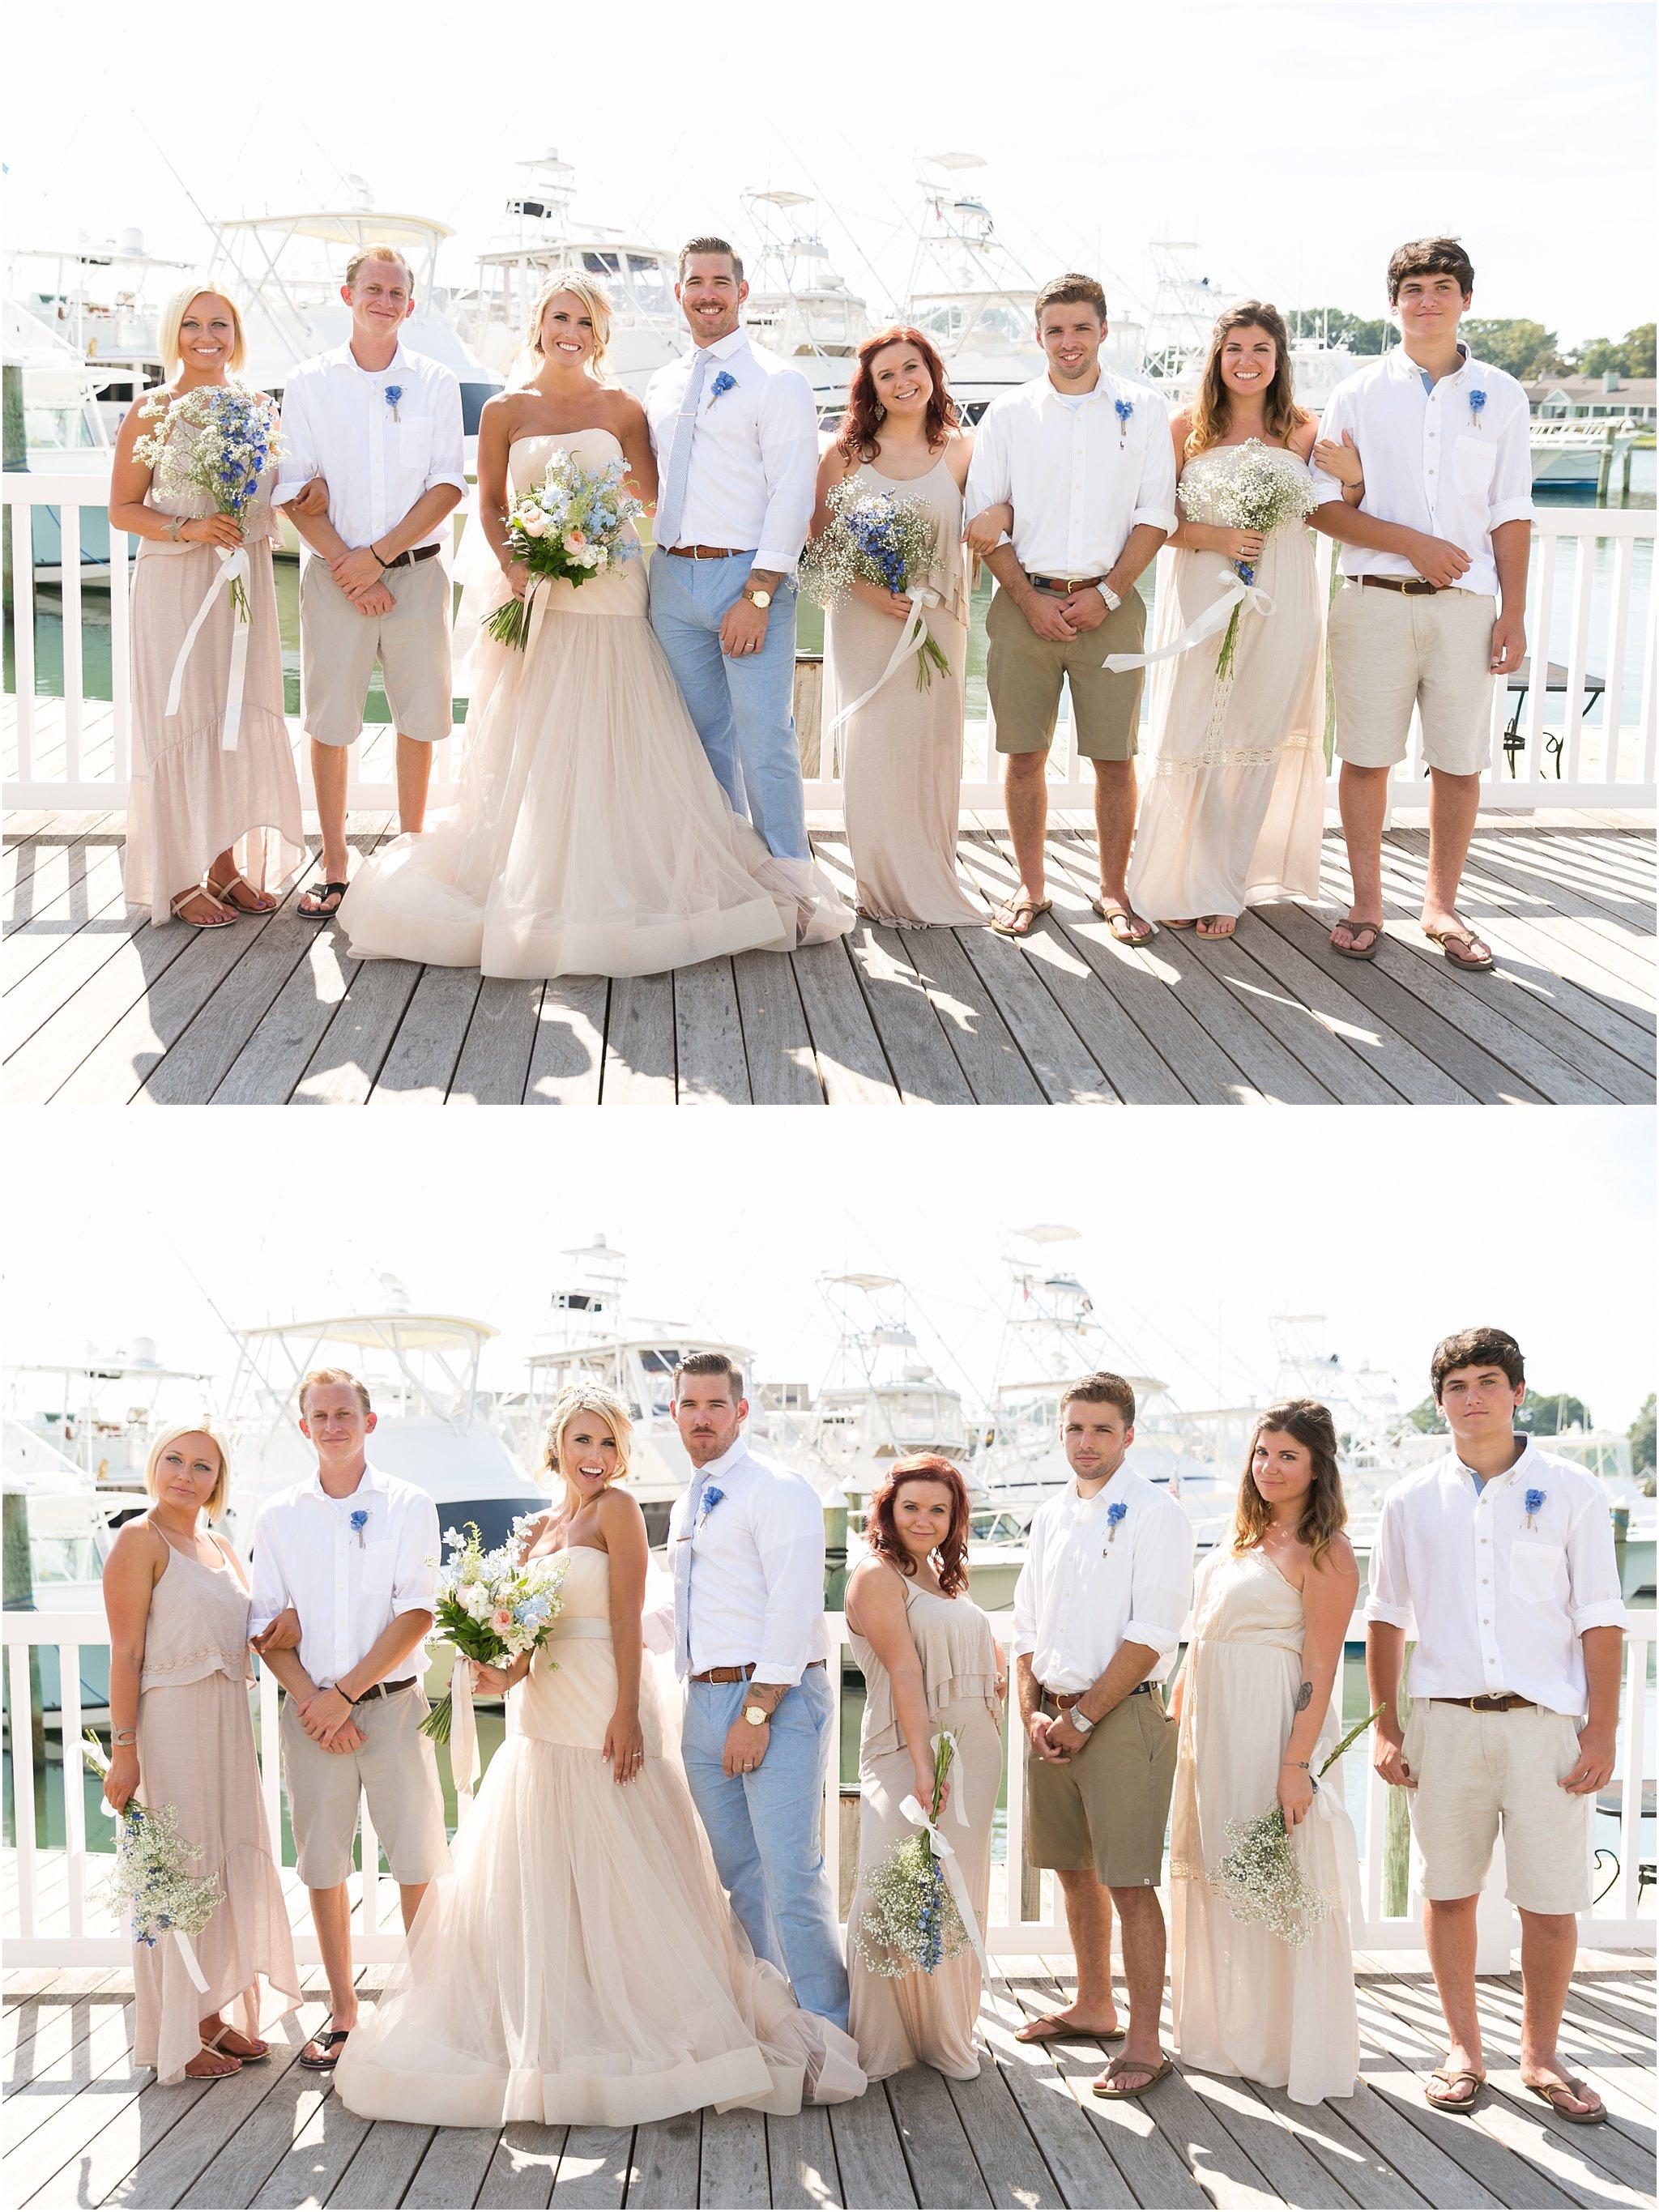 jessica_ryan_photography_virginia_beach_water_tabe_wedding_vera_wang_wedding_dress_0613